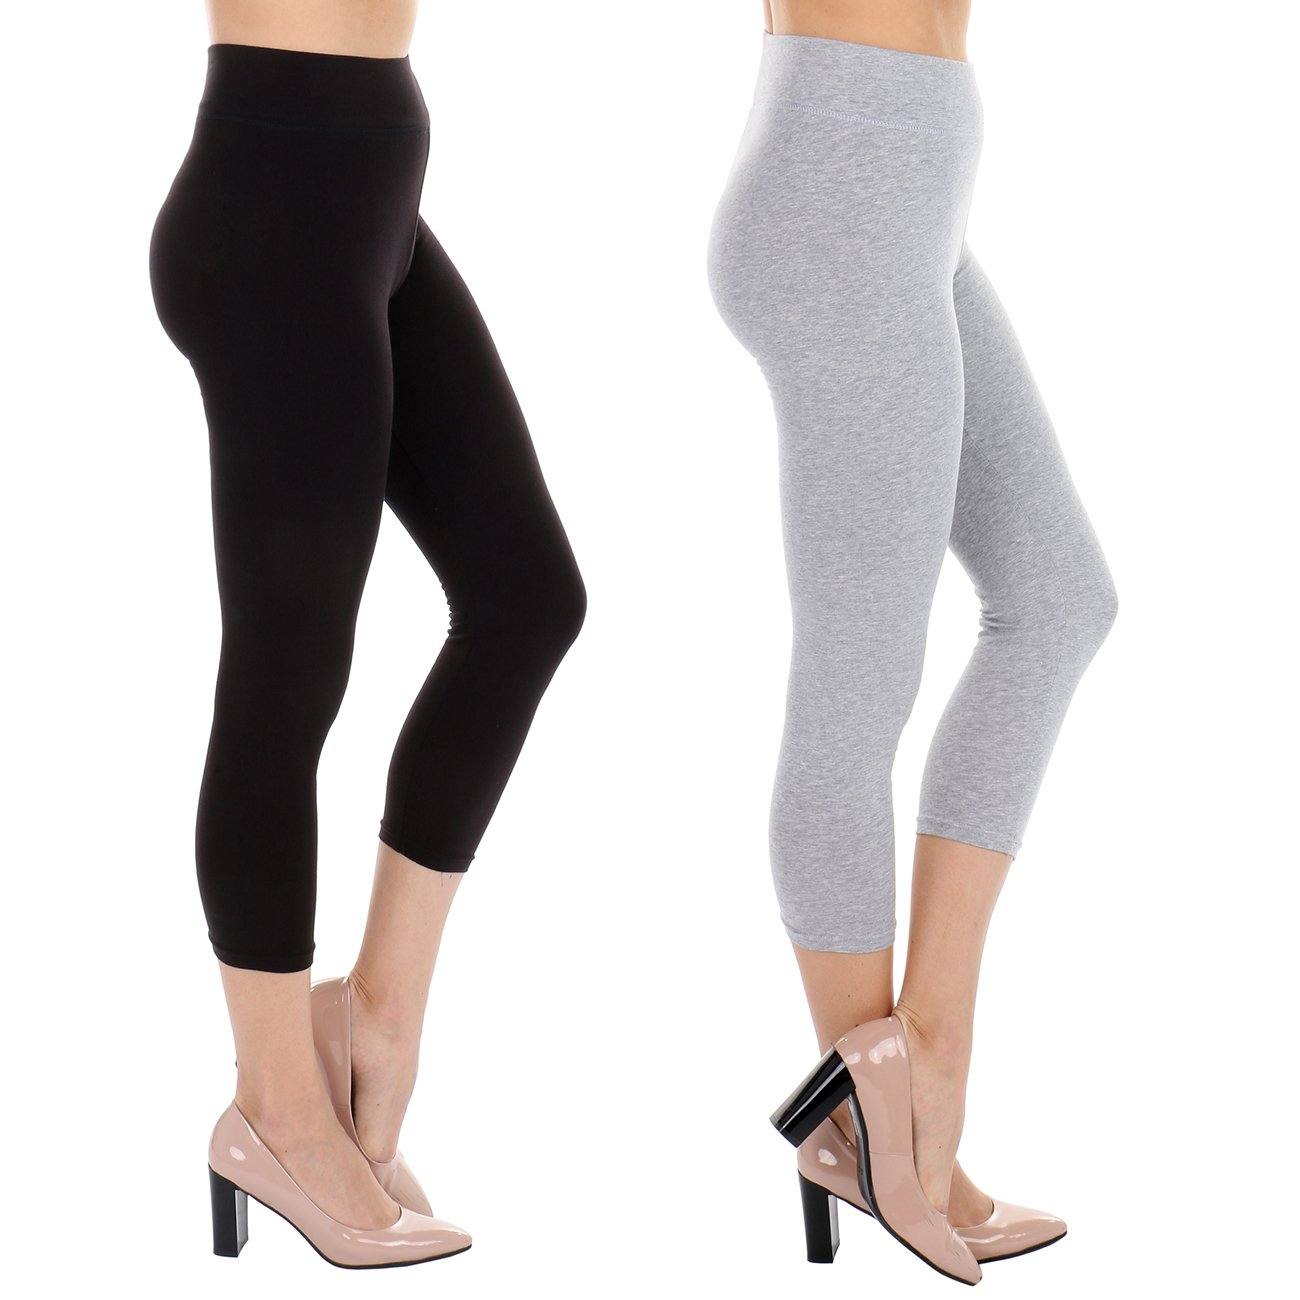 TODAY SHOWROOM Cotton Capri- Non See Thru Fabric-Yoga Waist Cropped Leggings (2pk (Black/H.Grey), Large)